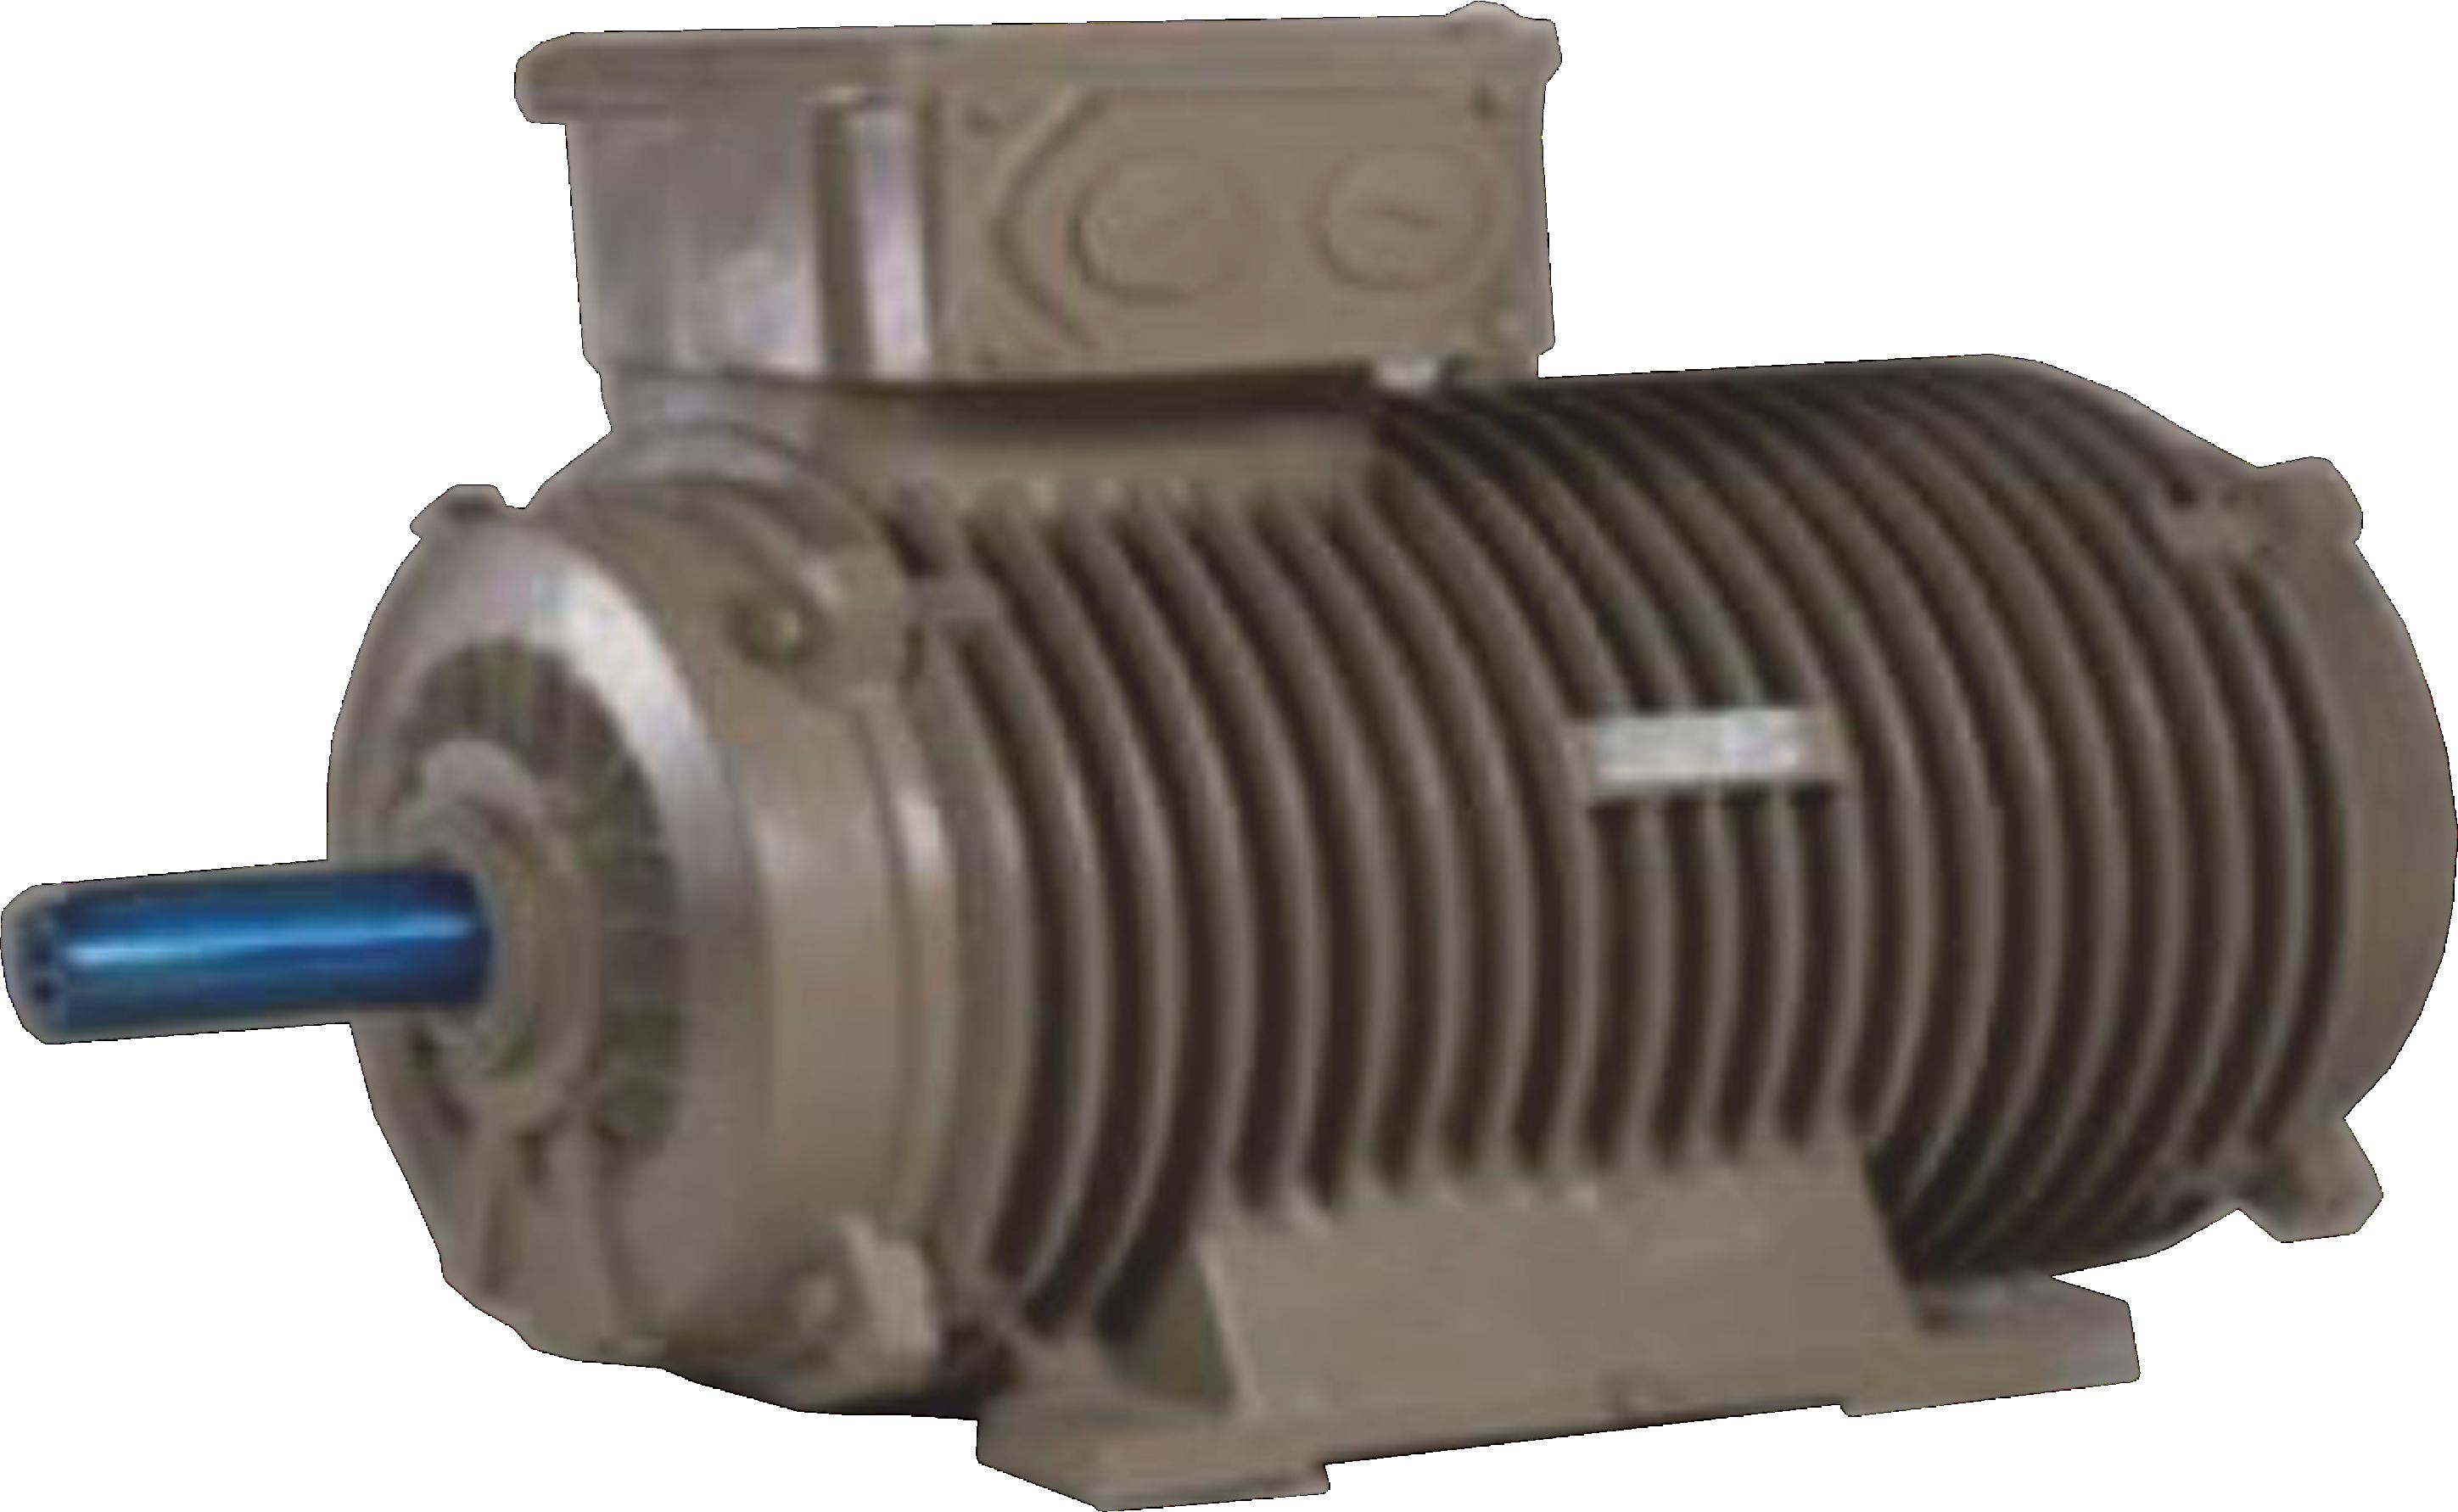 ... maintenance catalogue · compatible motors sold separately ...